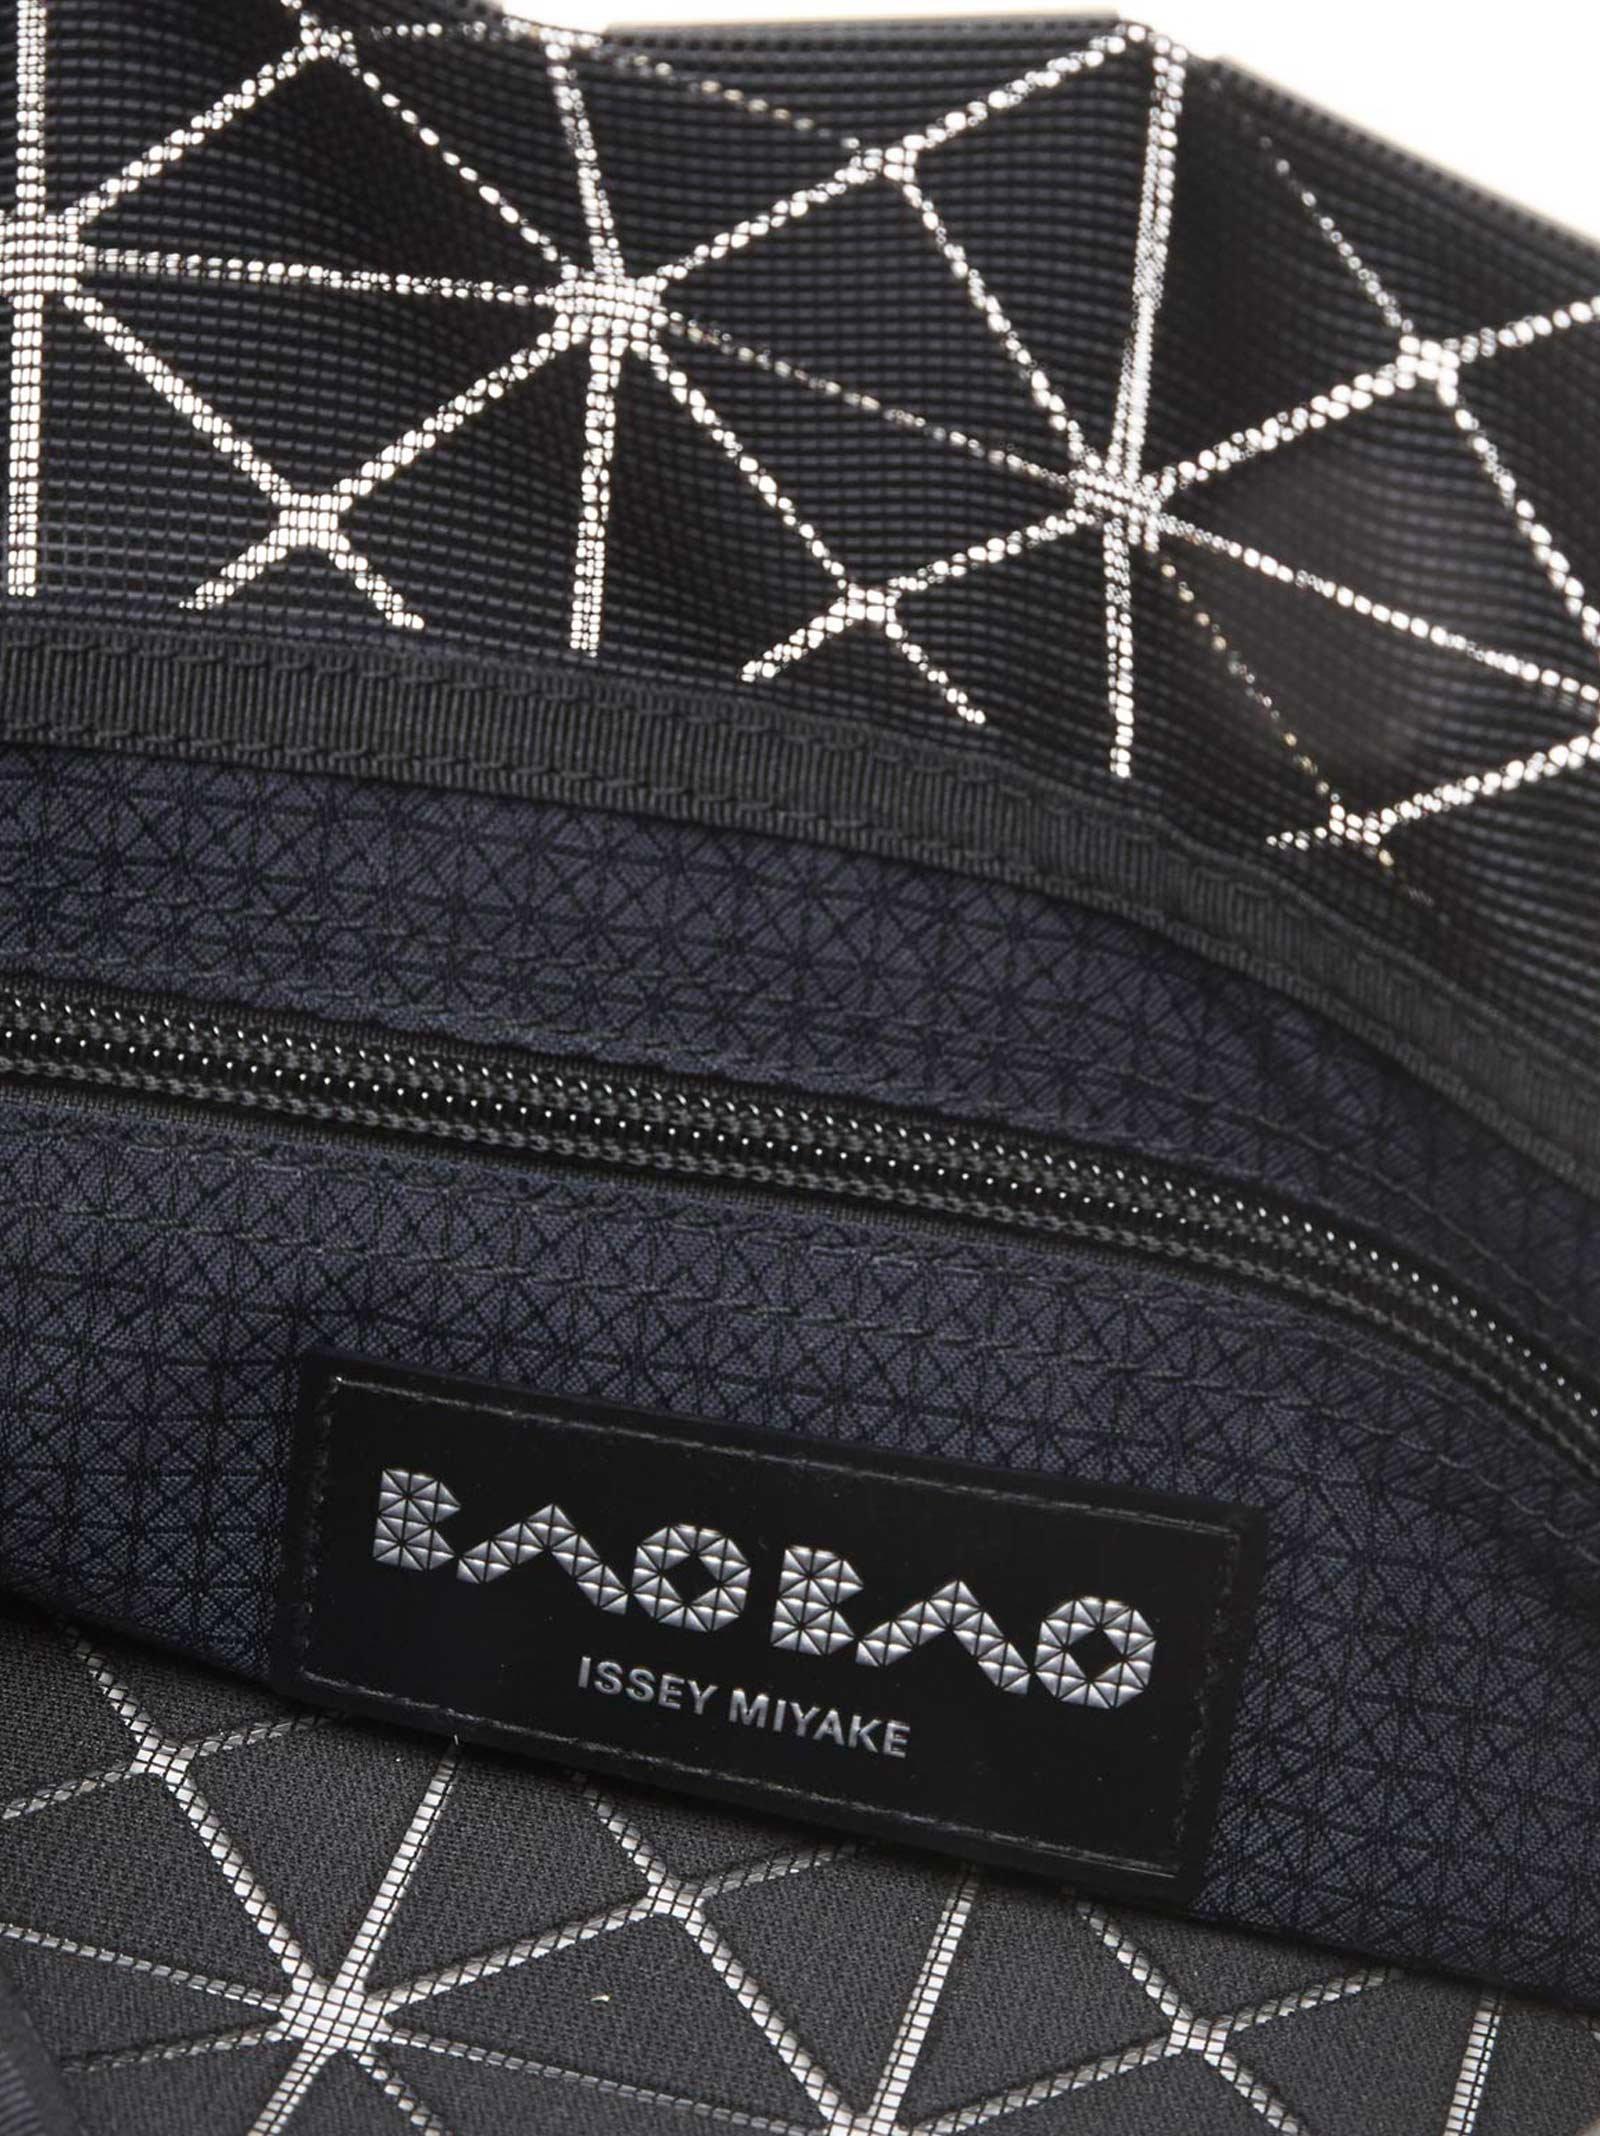 3b3c76d00a8d Bao Bao Issey Miyake Bao Bao Issey Miyake  platinum Stardust  Bag ...